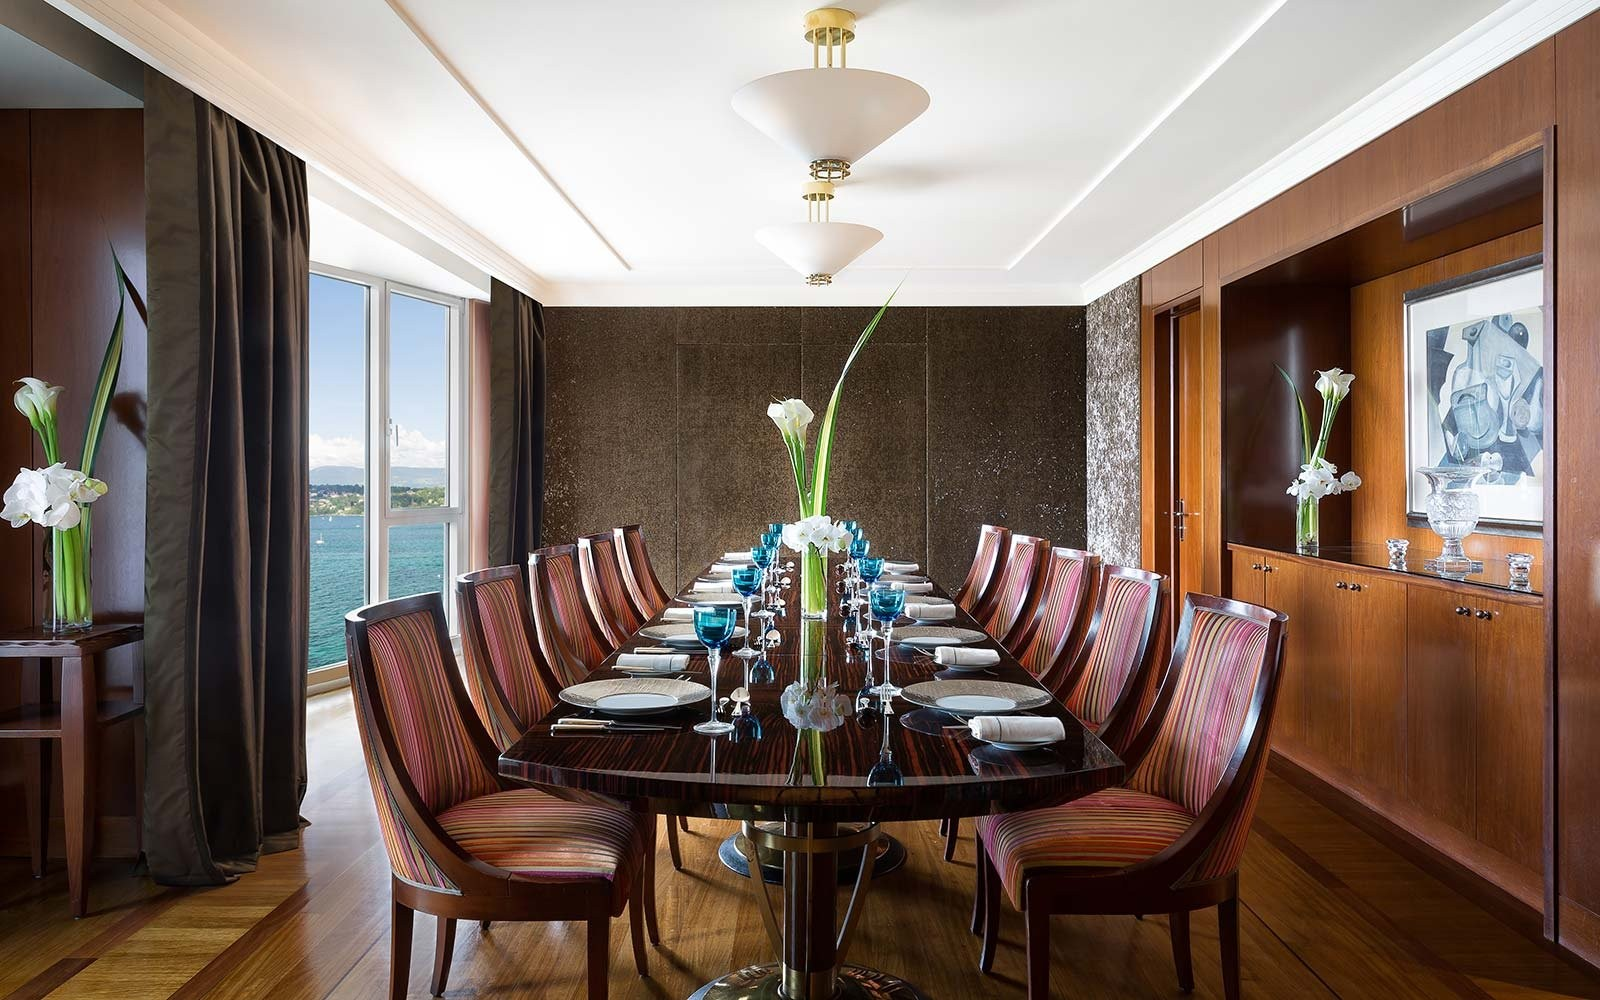 dining-hotel-president-wilson-geneva-expensivesuite1017